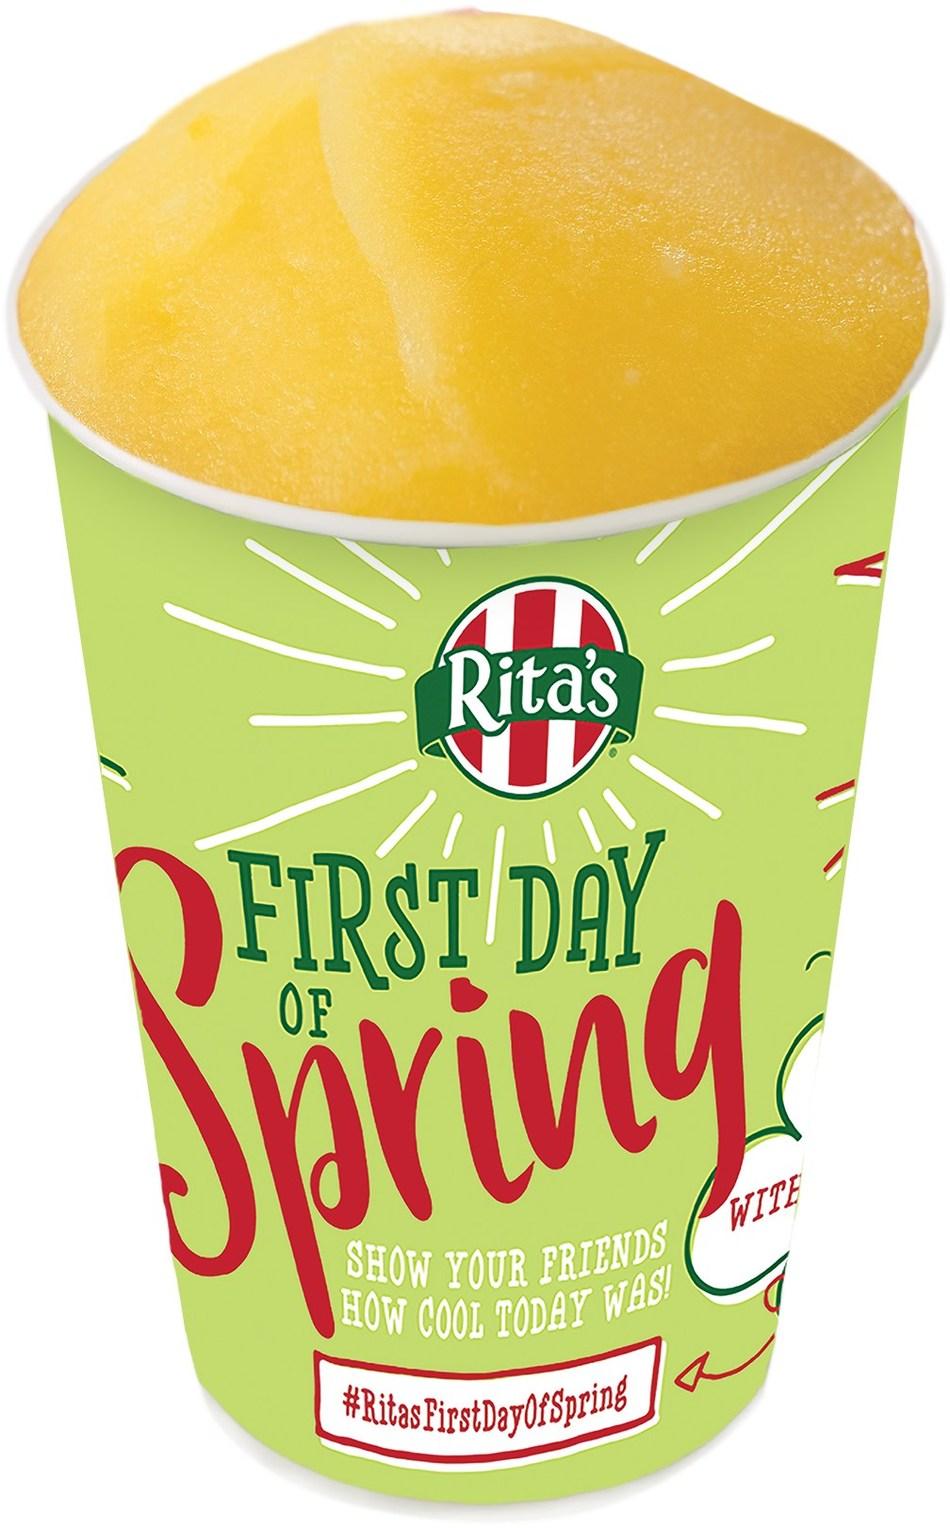 Rita's Italian Ice celebrates its 25th annual First Day of Spring Free Italian Ice Giveaway.